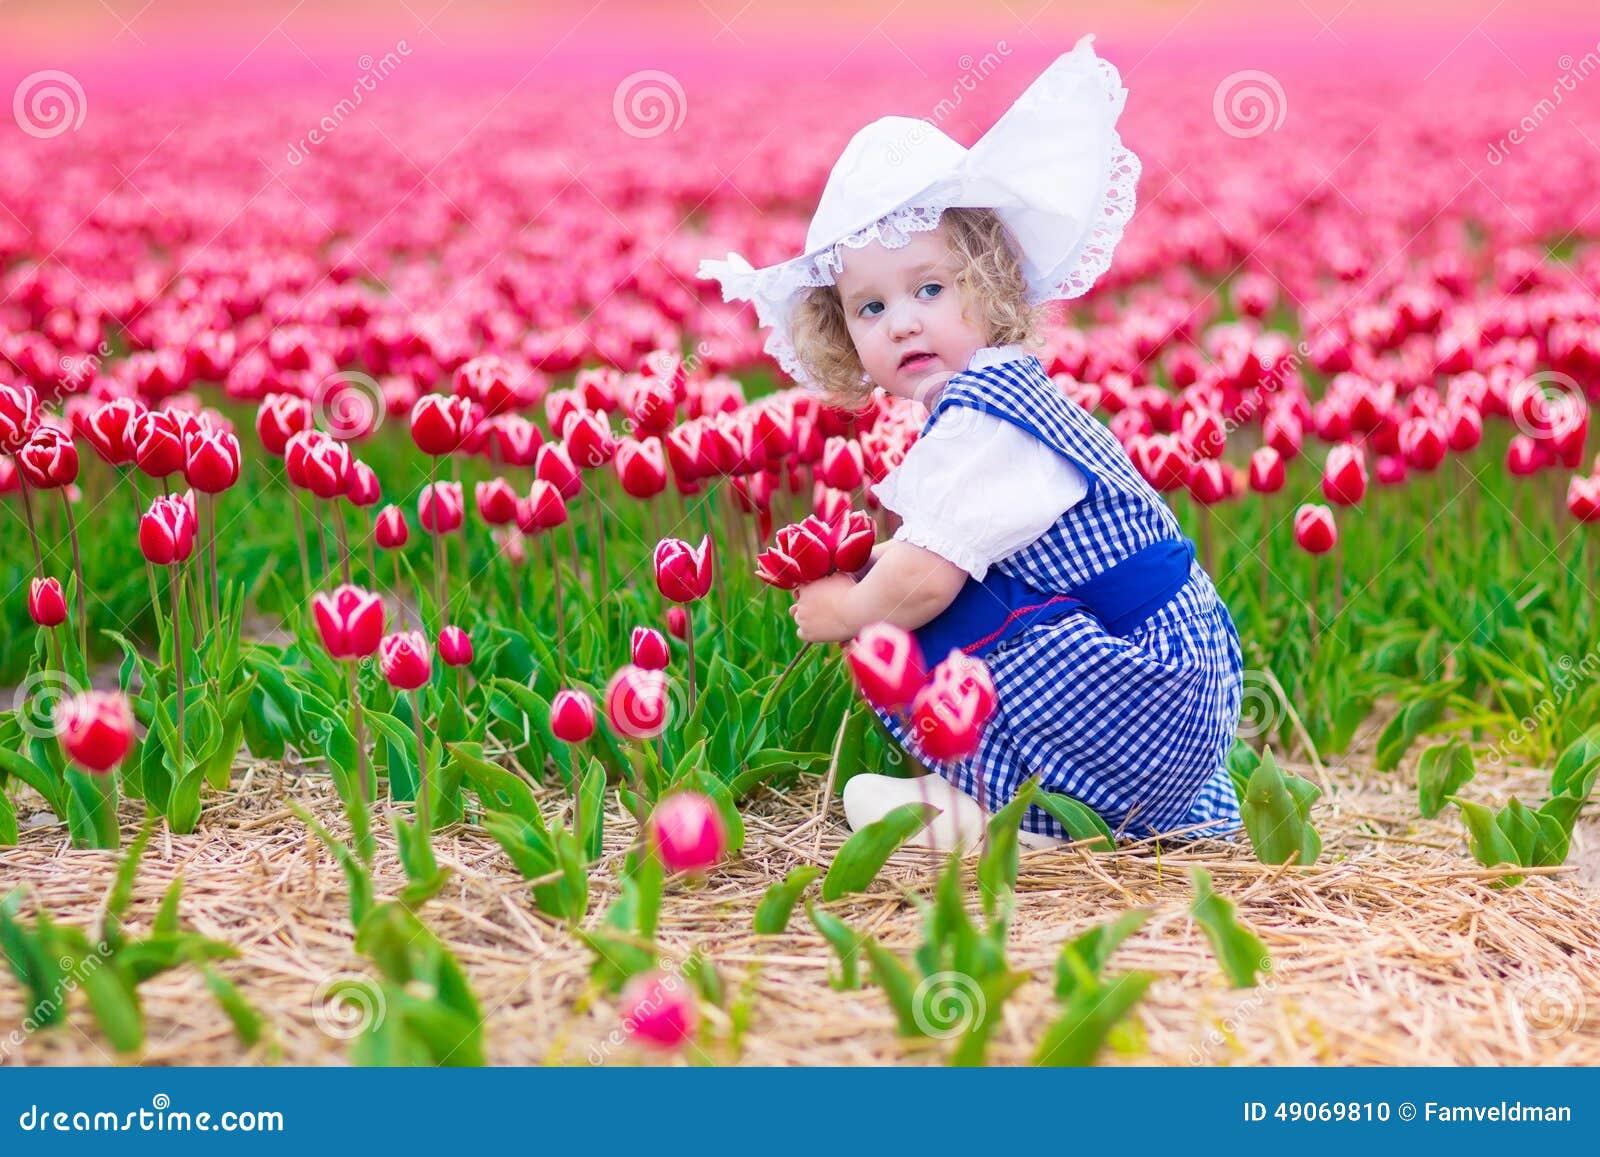 Dutch Girl In Tulip Field In Holland Stock Photo - Image ...